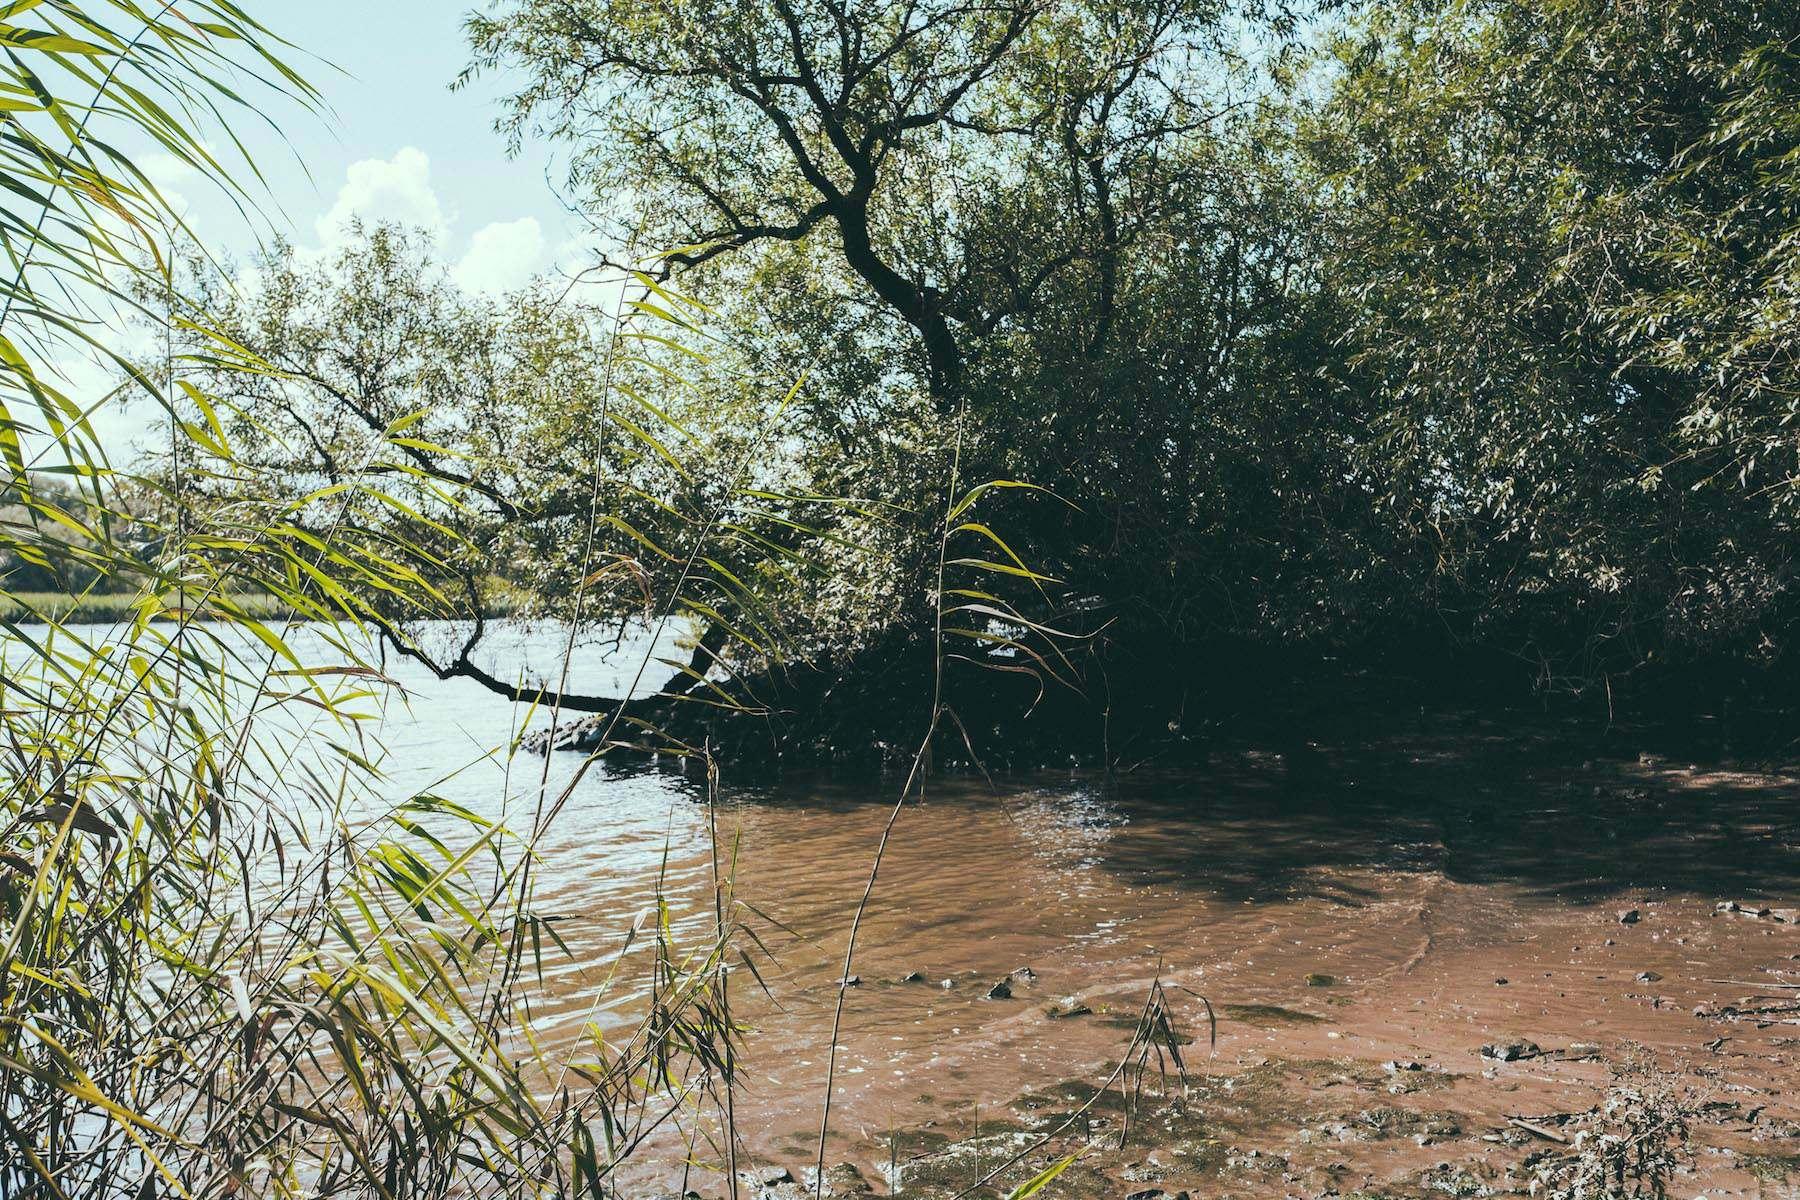 Geheimtipp Hamburg Natur & Ausflüge Wilhemsburg Naturschutzgebiet Heuckenlock Cristina Lopez 6